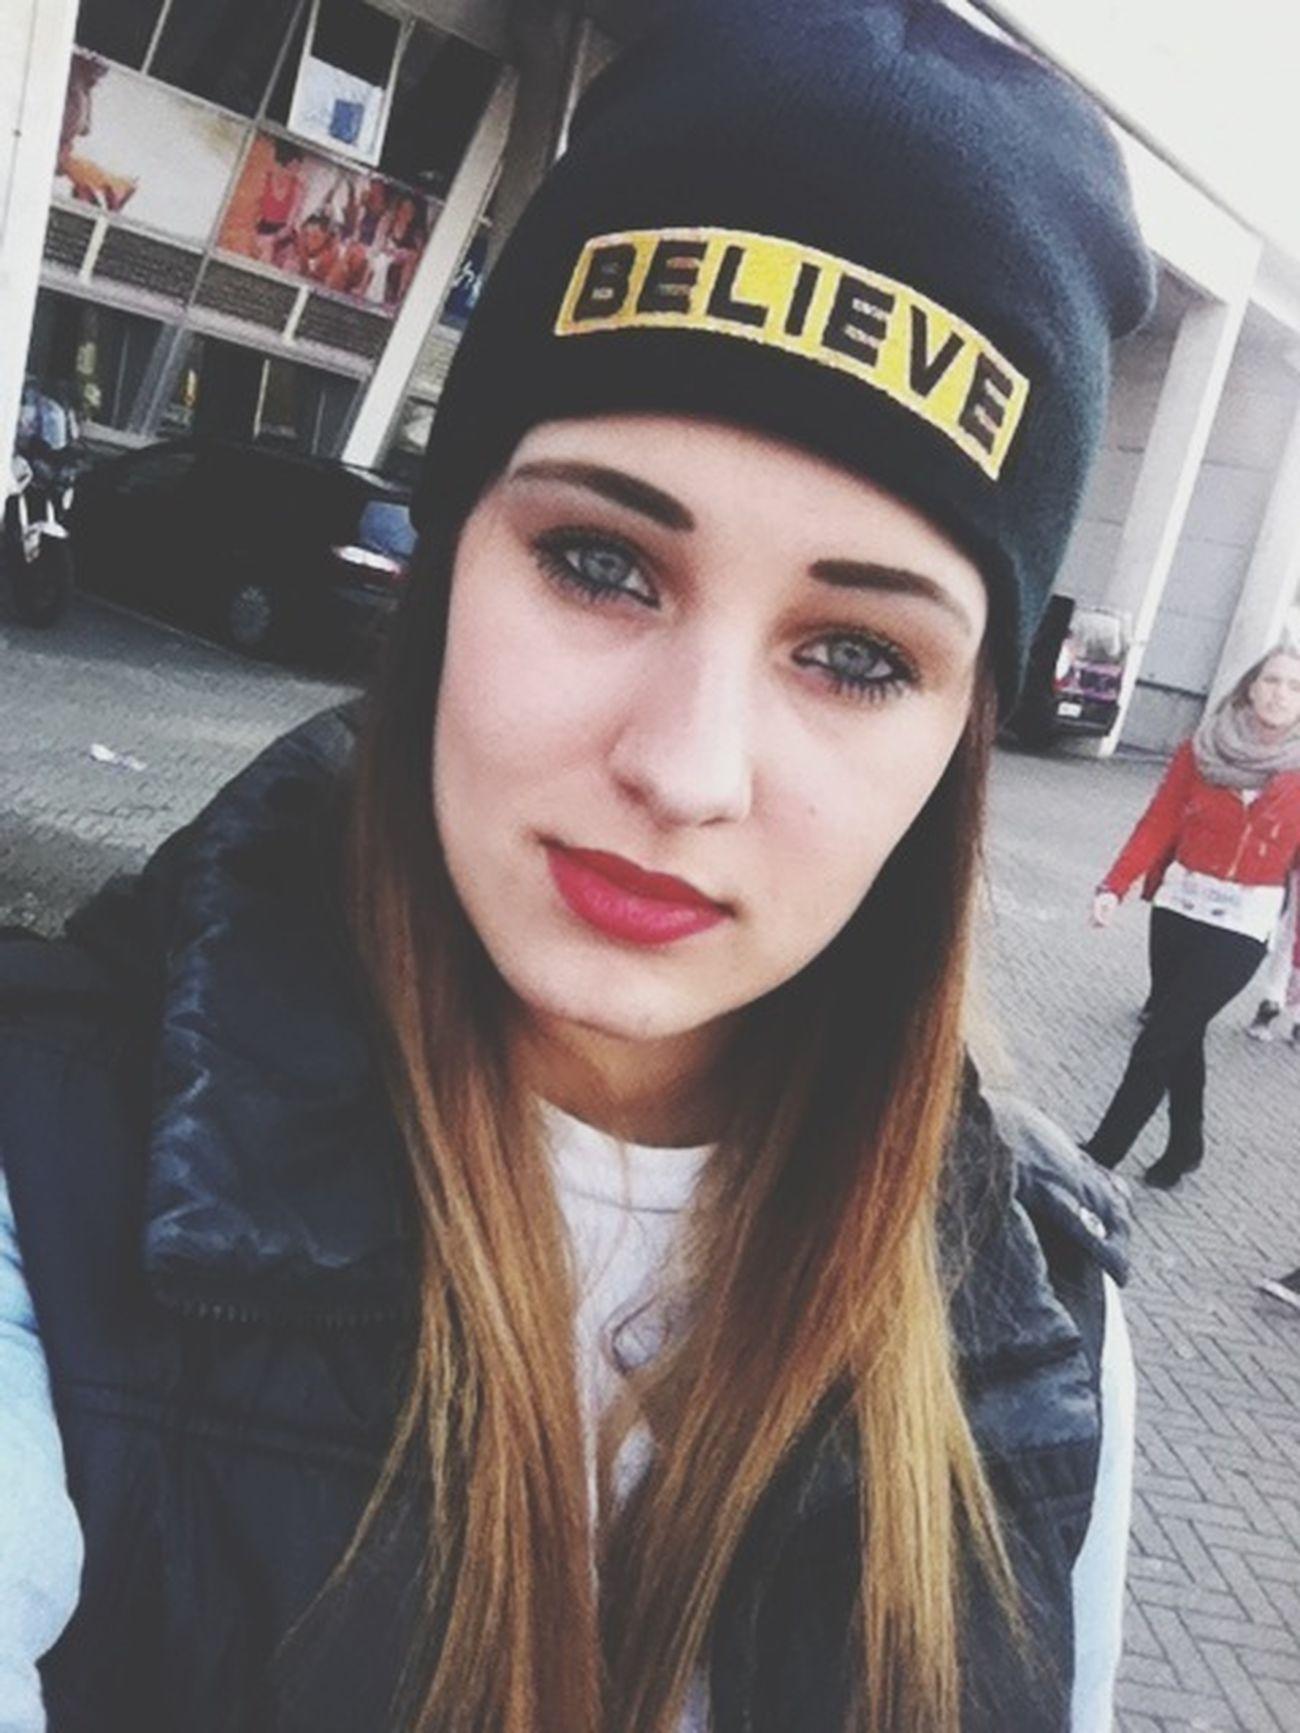 #justinbieber #believe #believetour